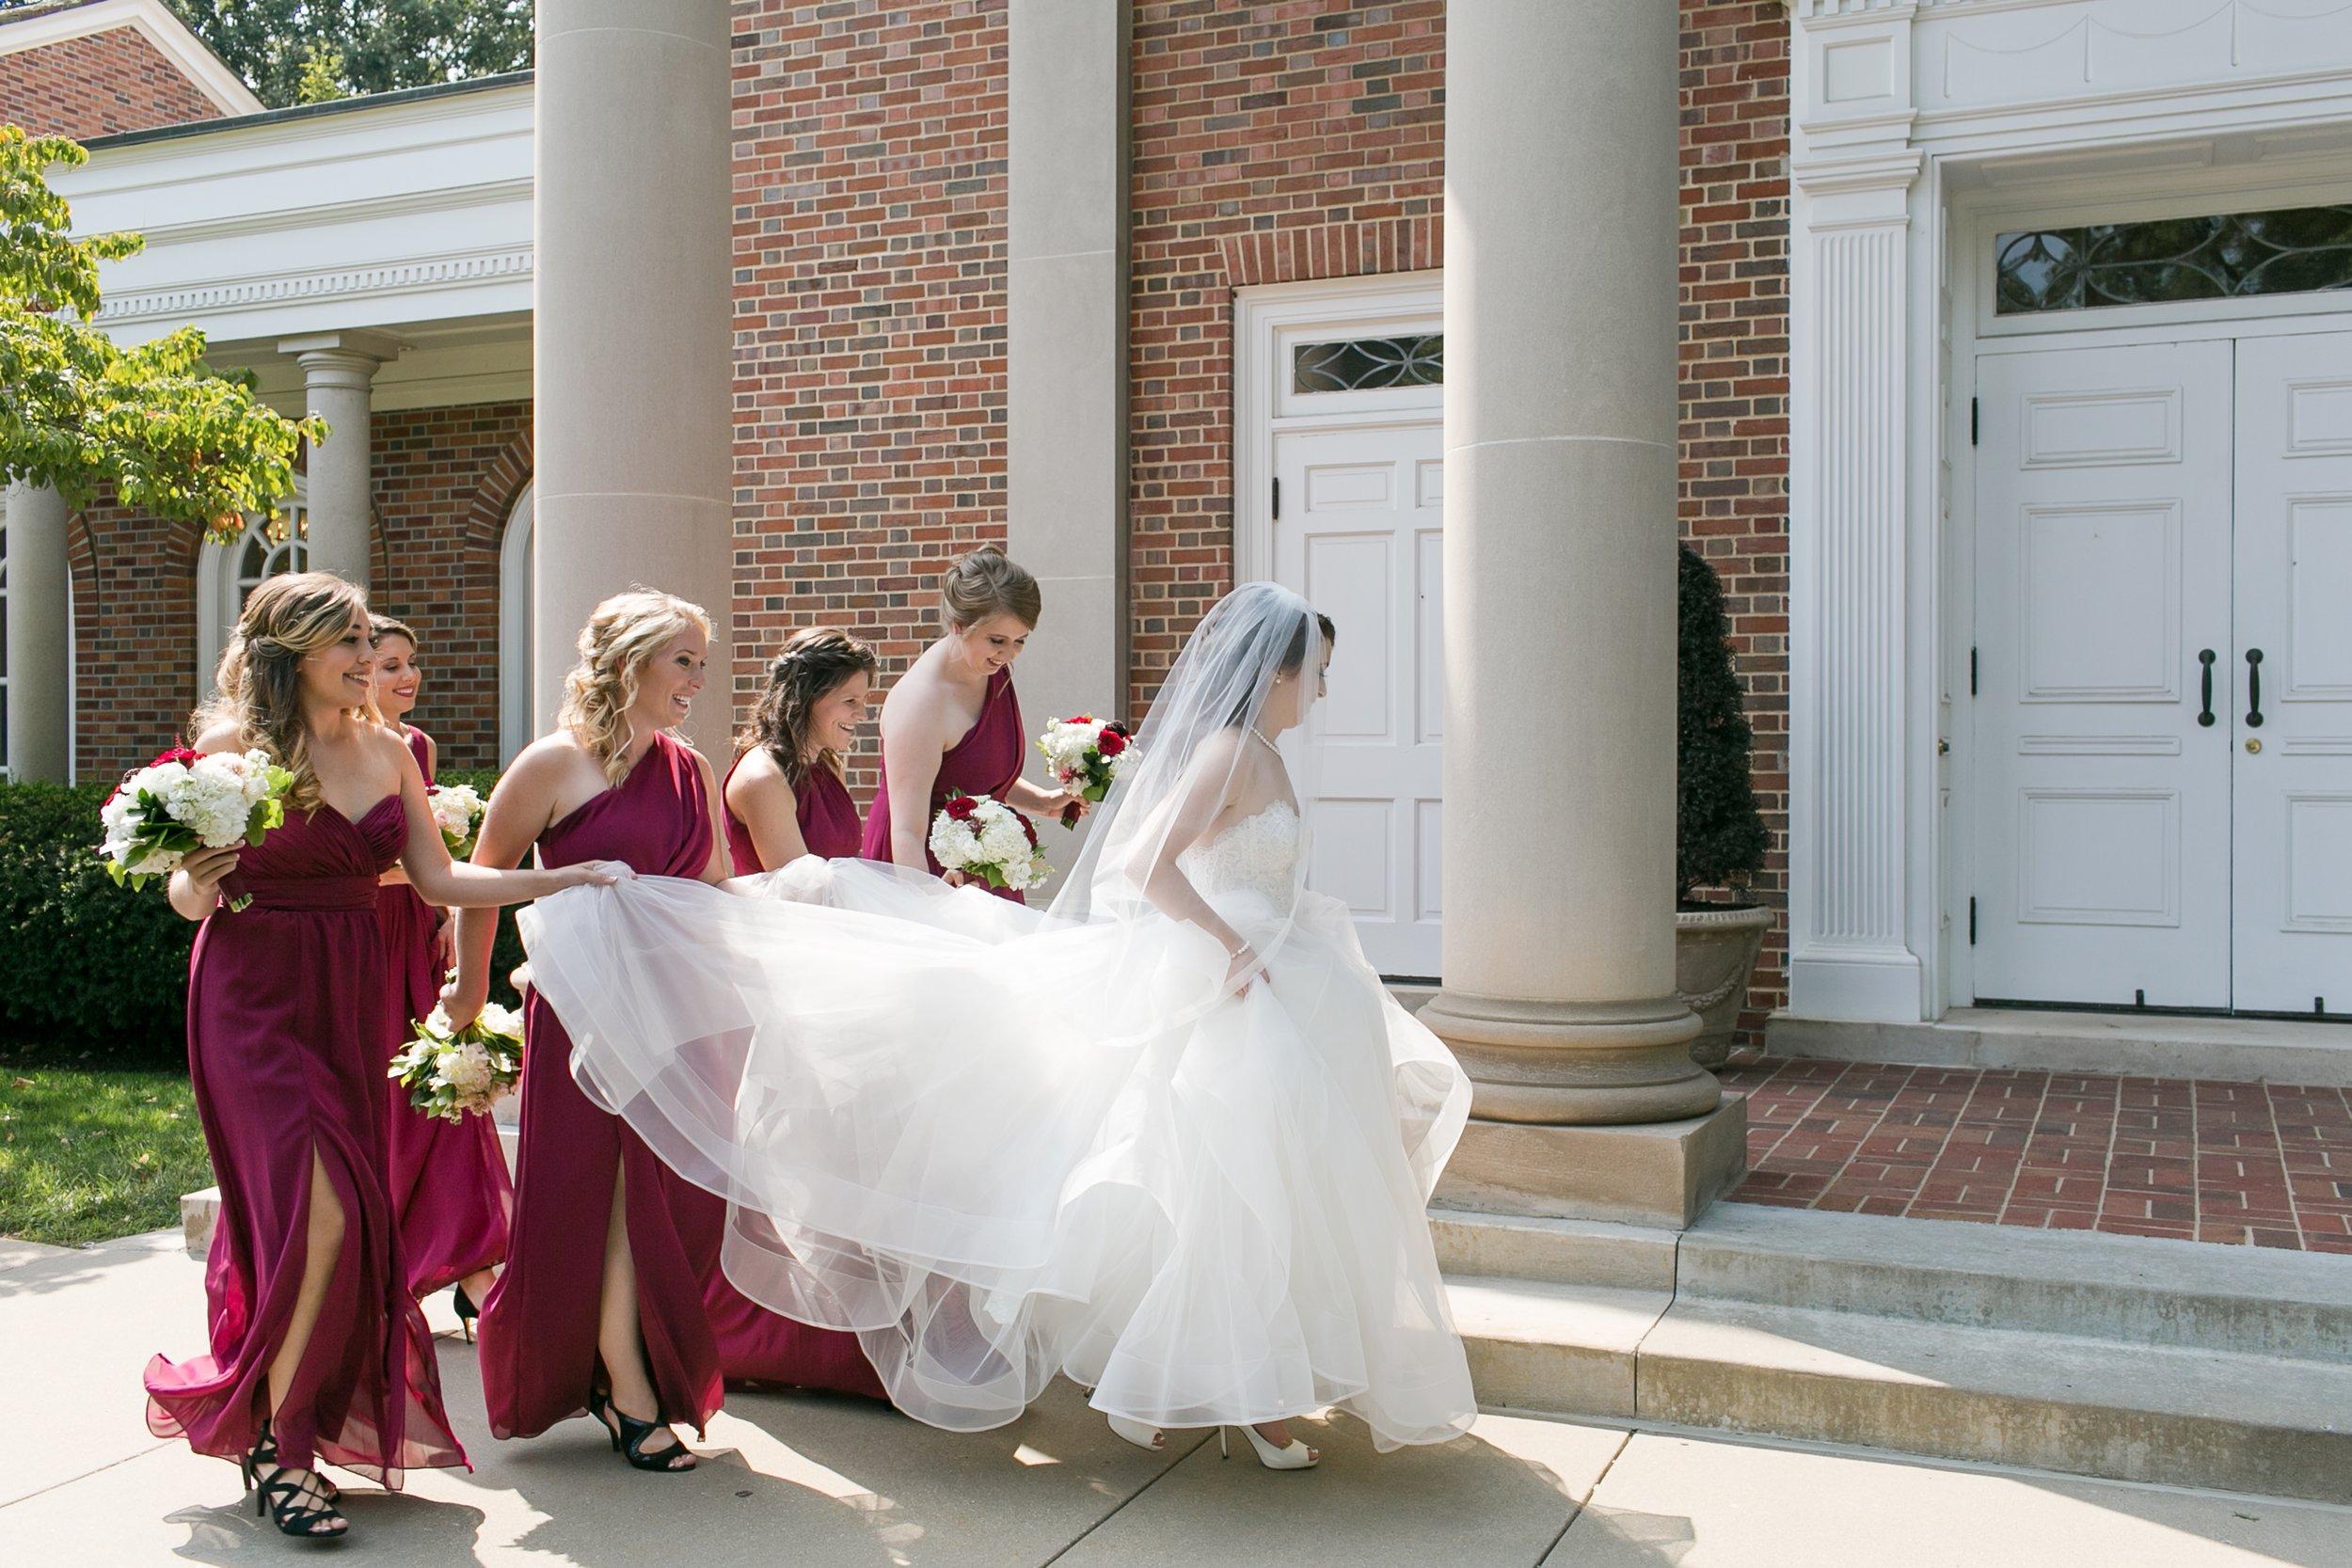 2017Sept9-Kay-Wedding-MissionTheatre-0321.jpg